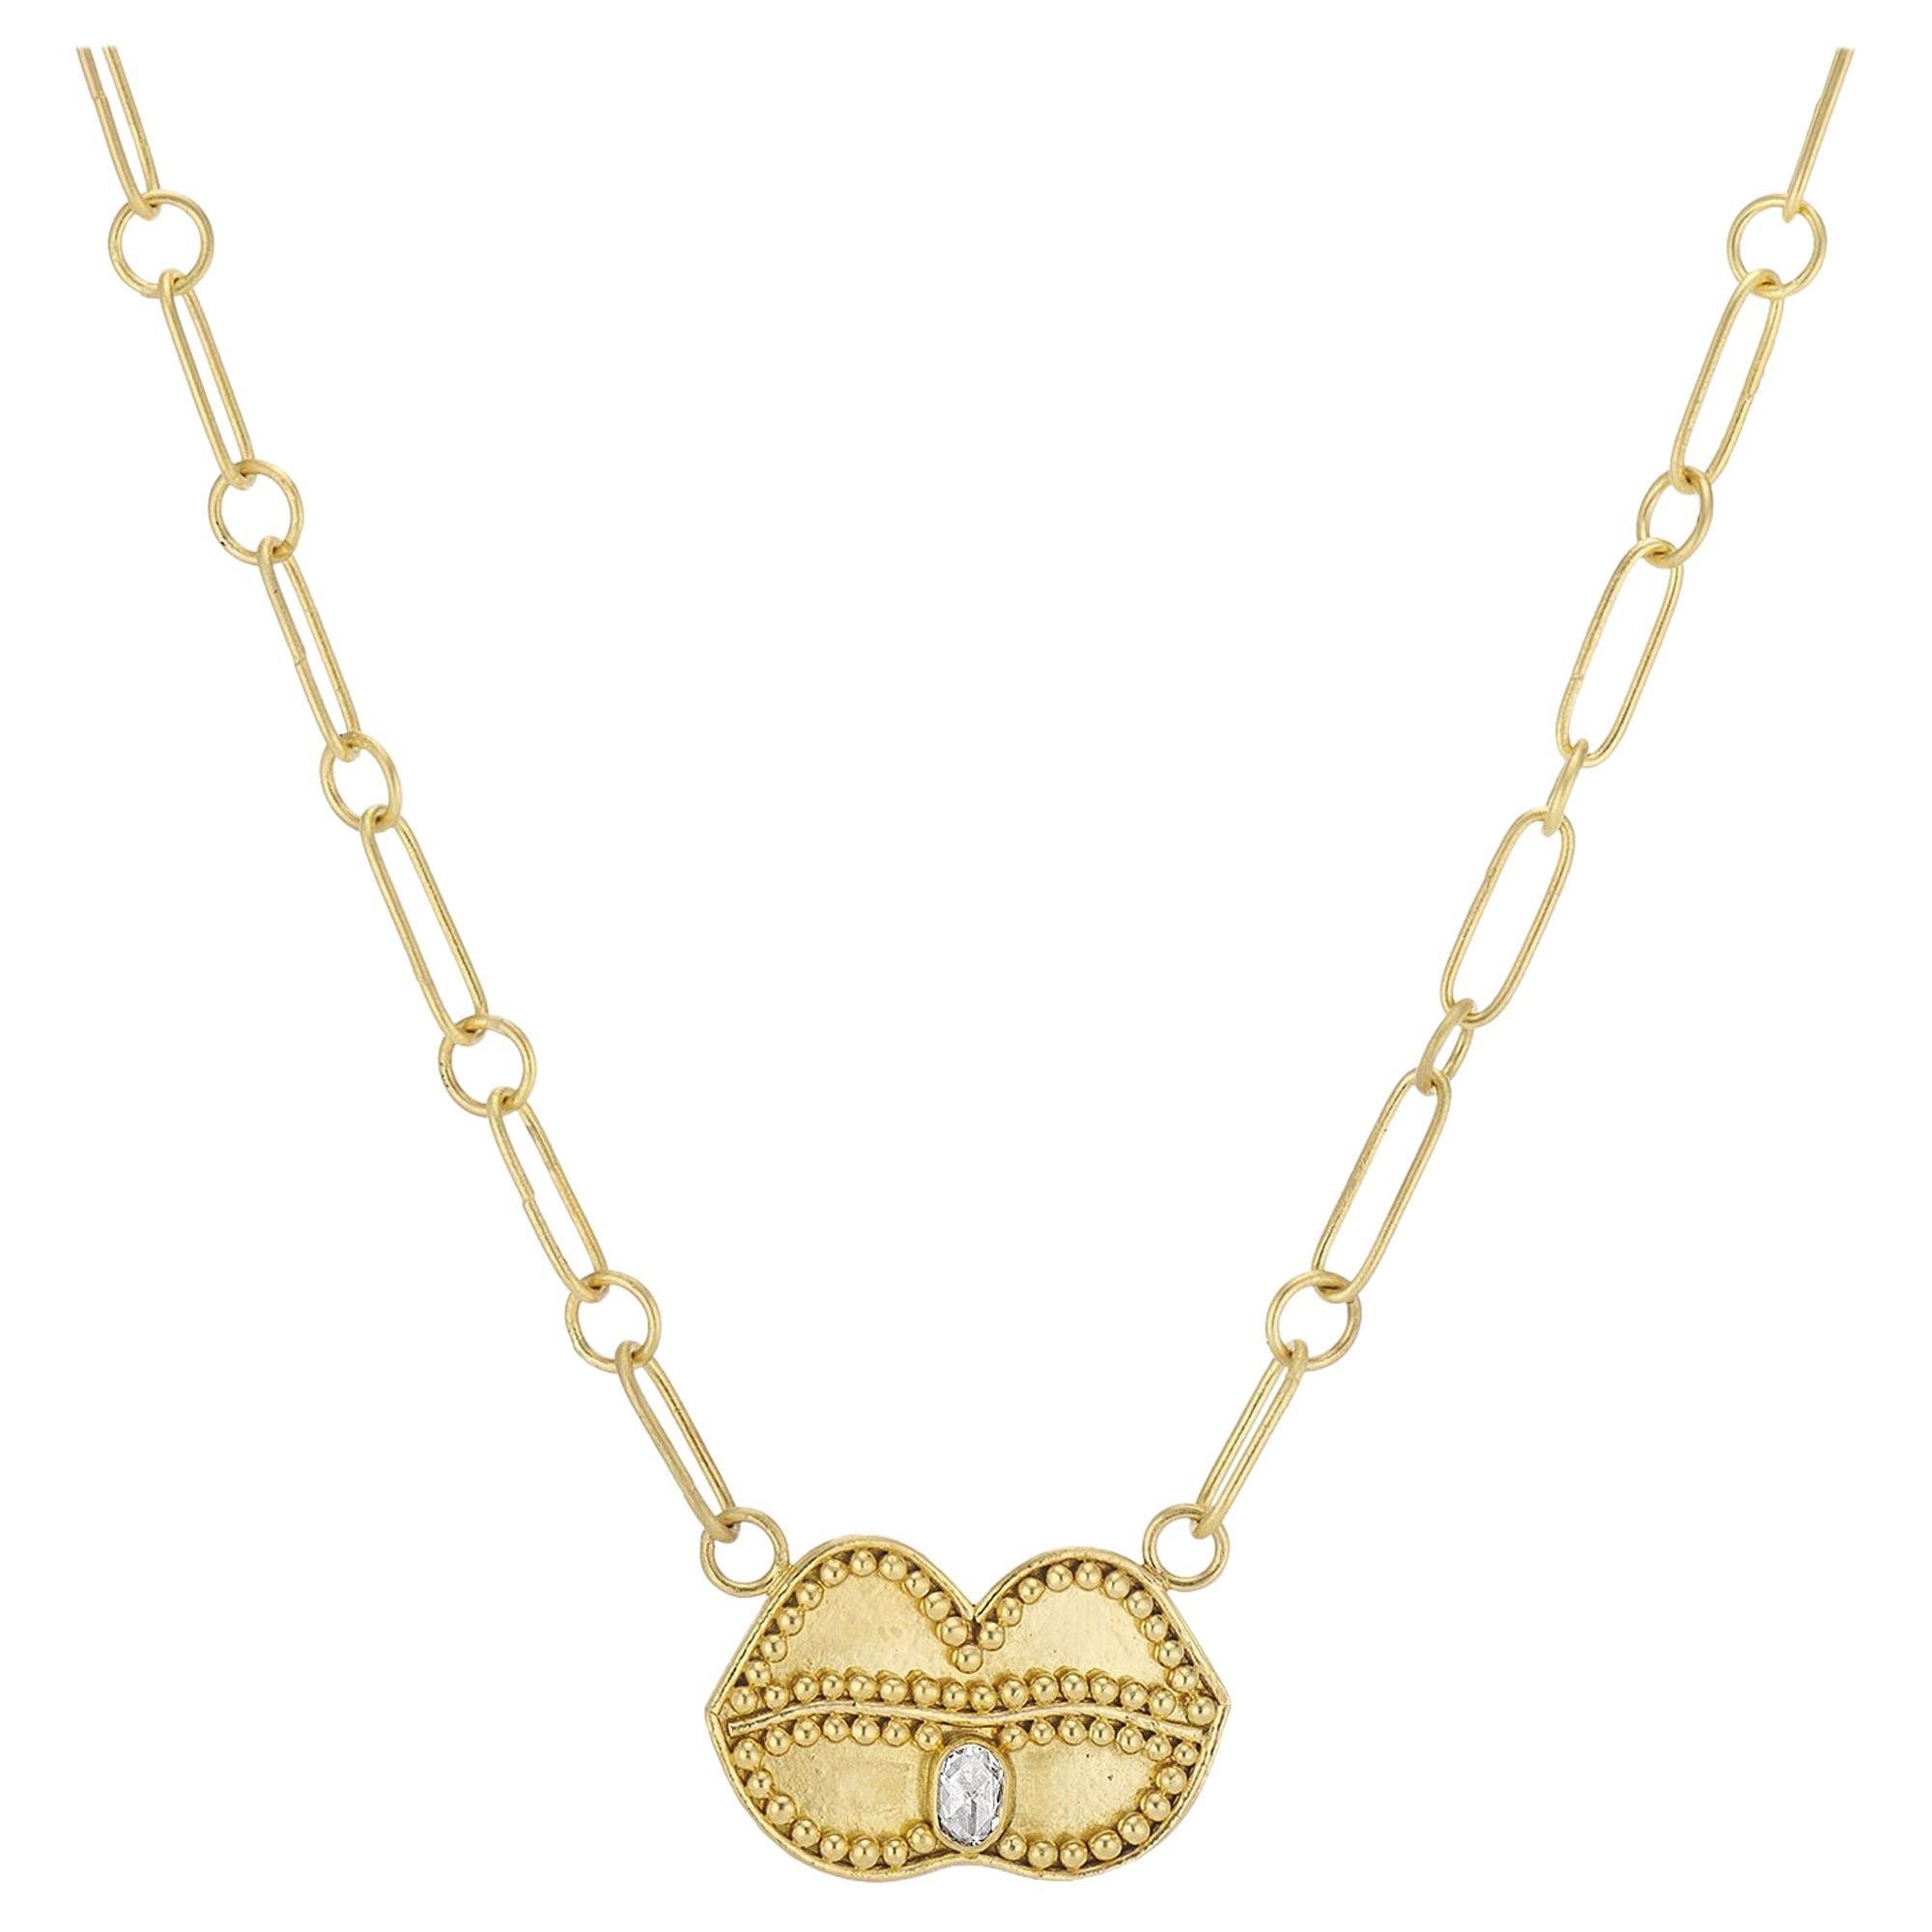 Deborah Meyers Experience 22 Karat Gold Granulated Lips with Rose Cut Diamond